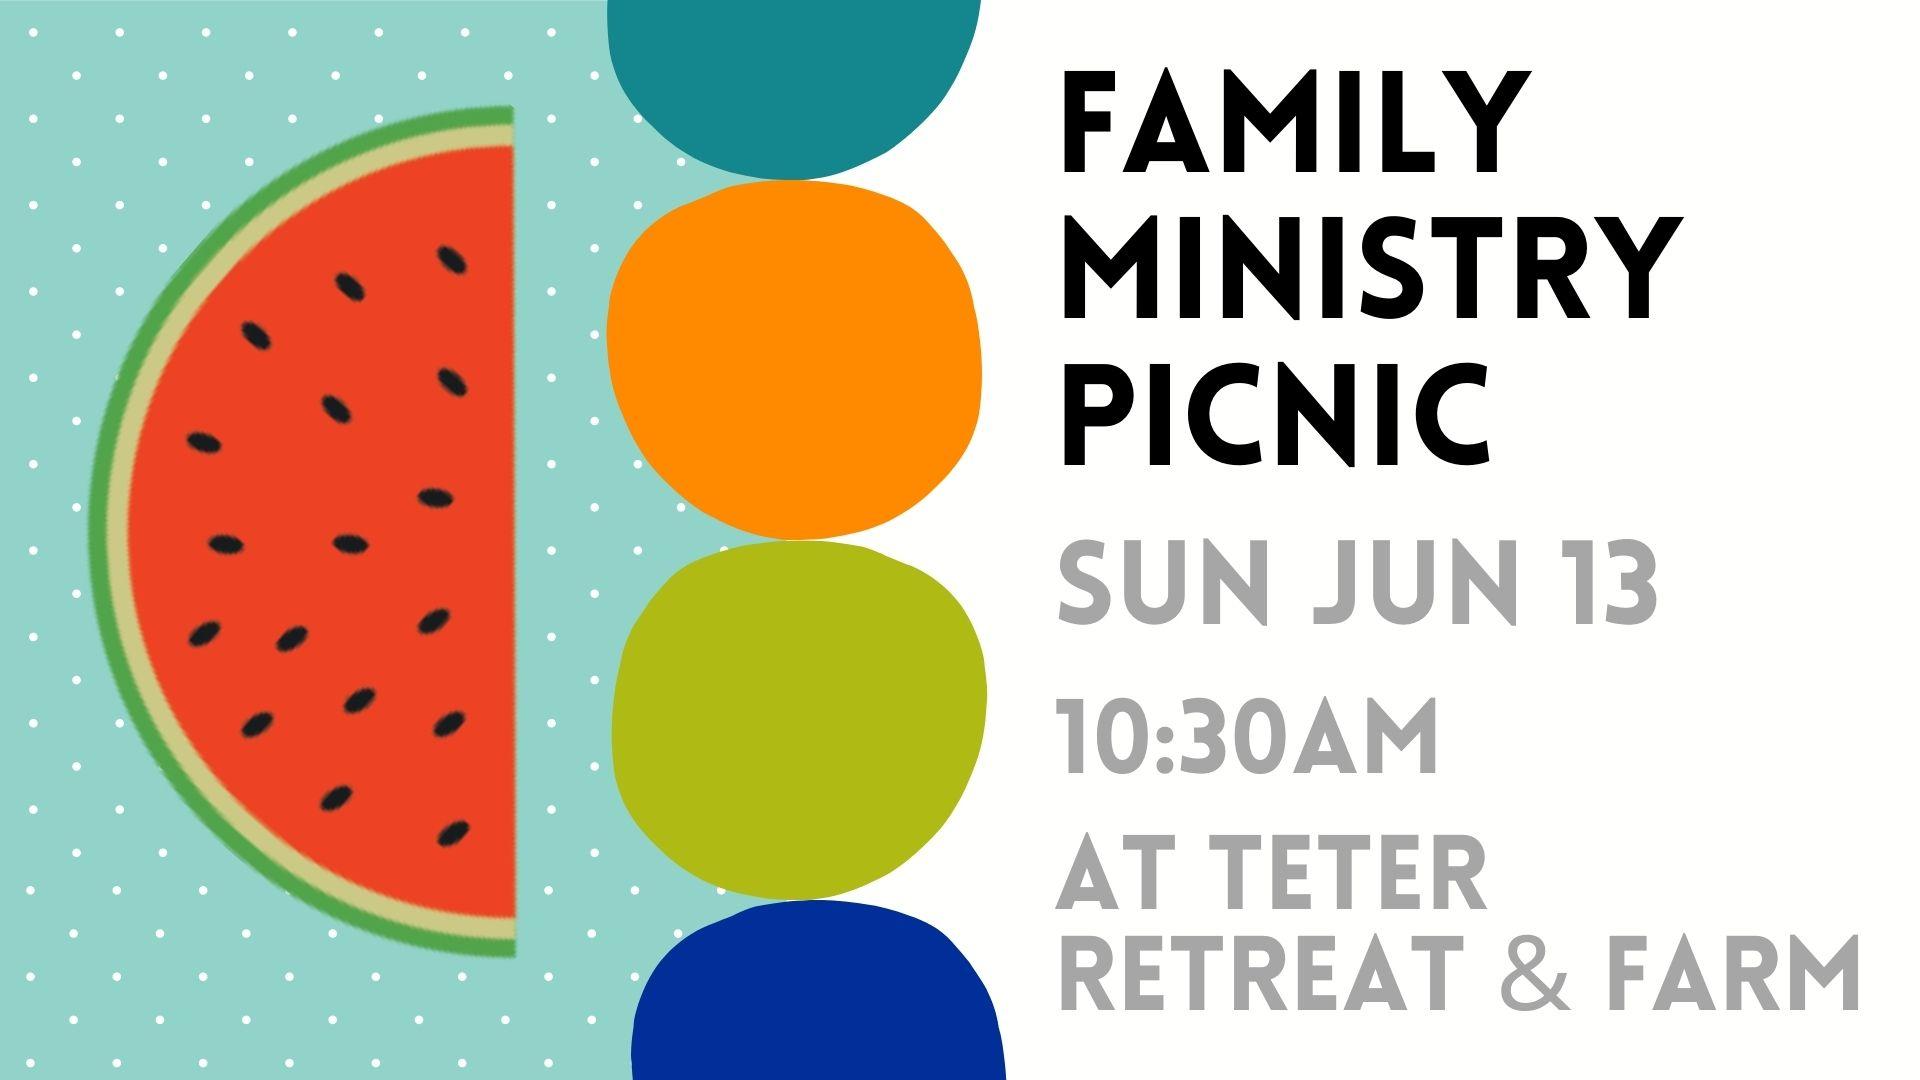 Family Ministry Picnic | slideA